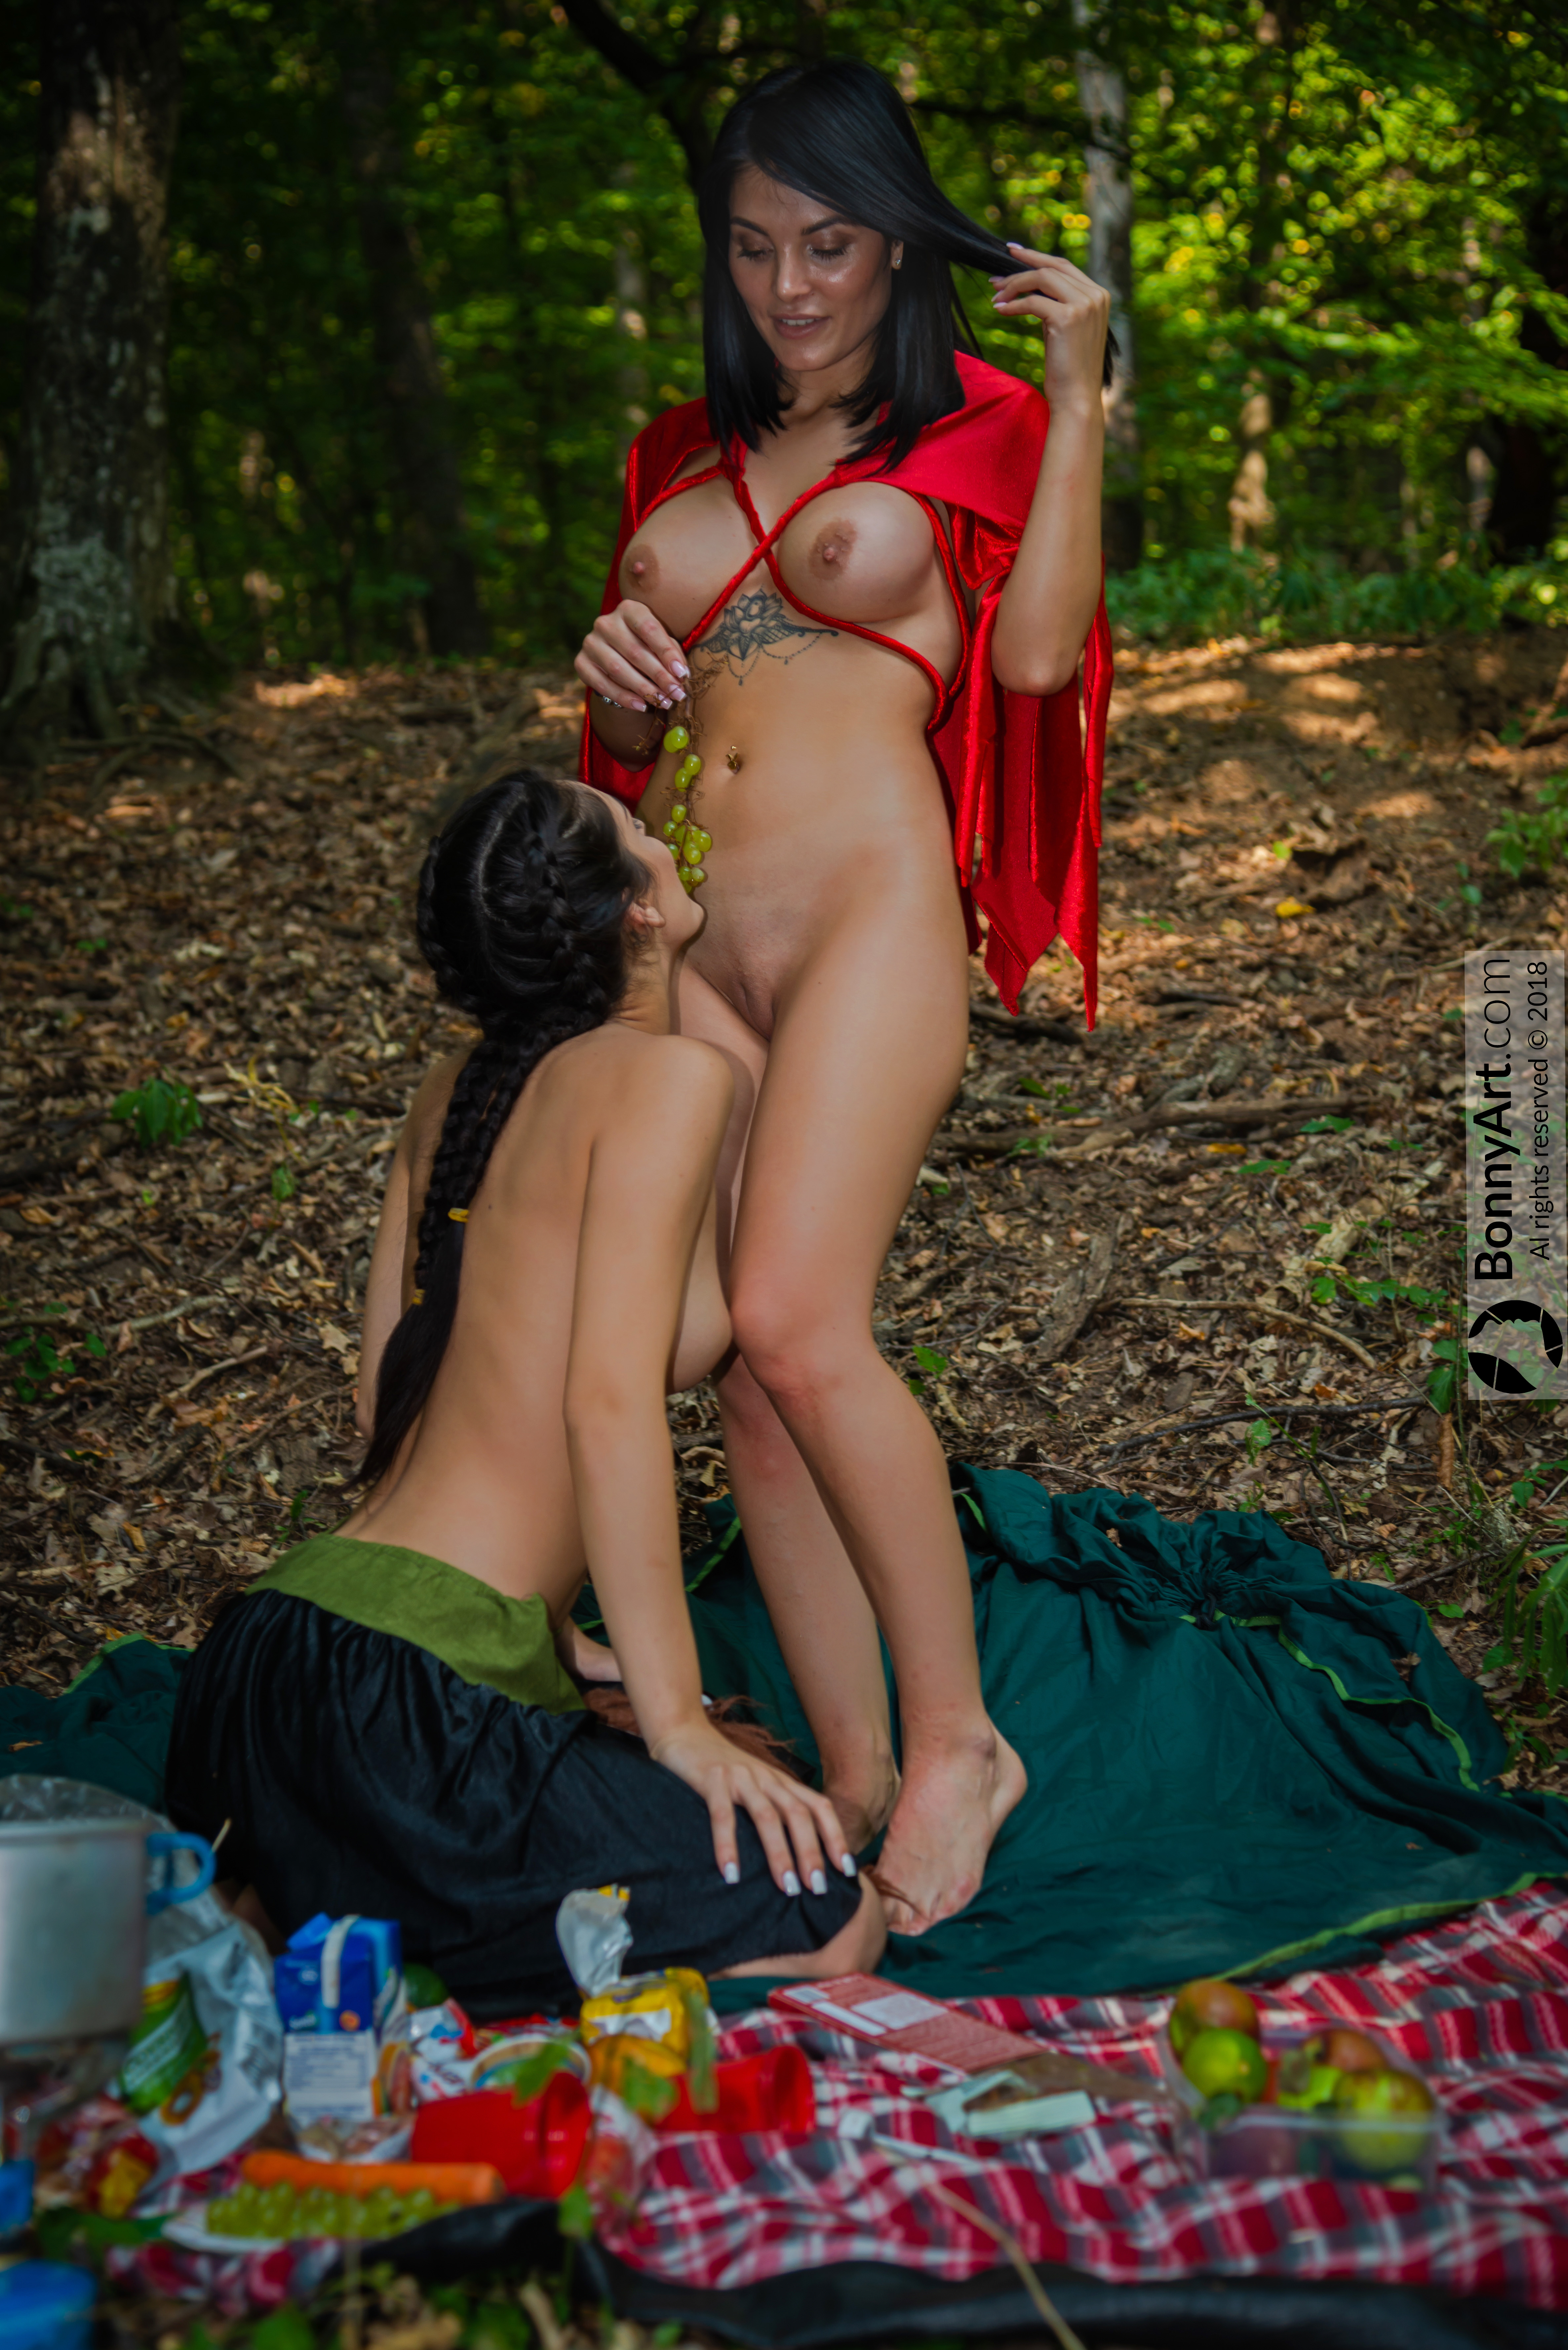 Forest Girls Naked Picnic Eating